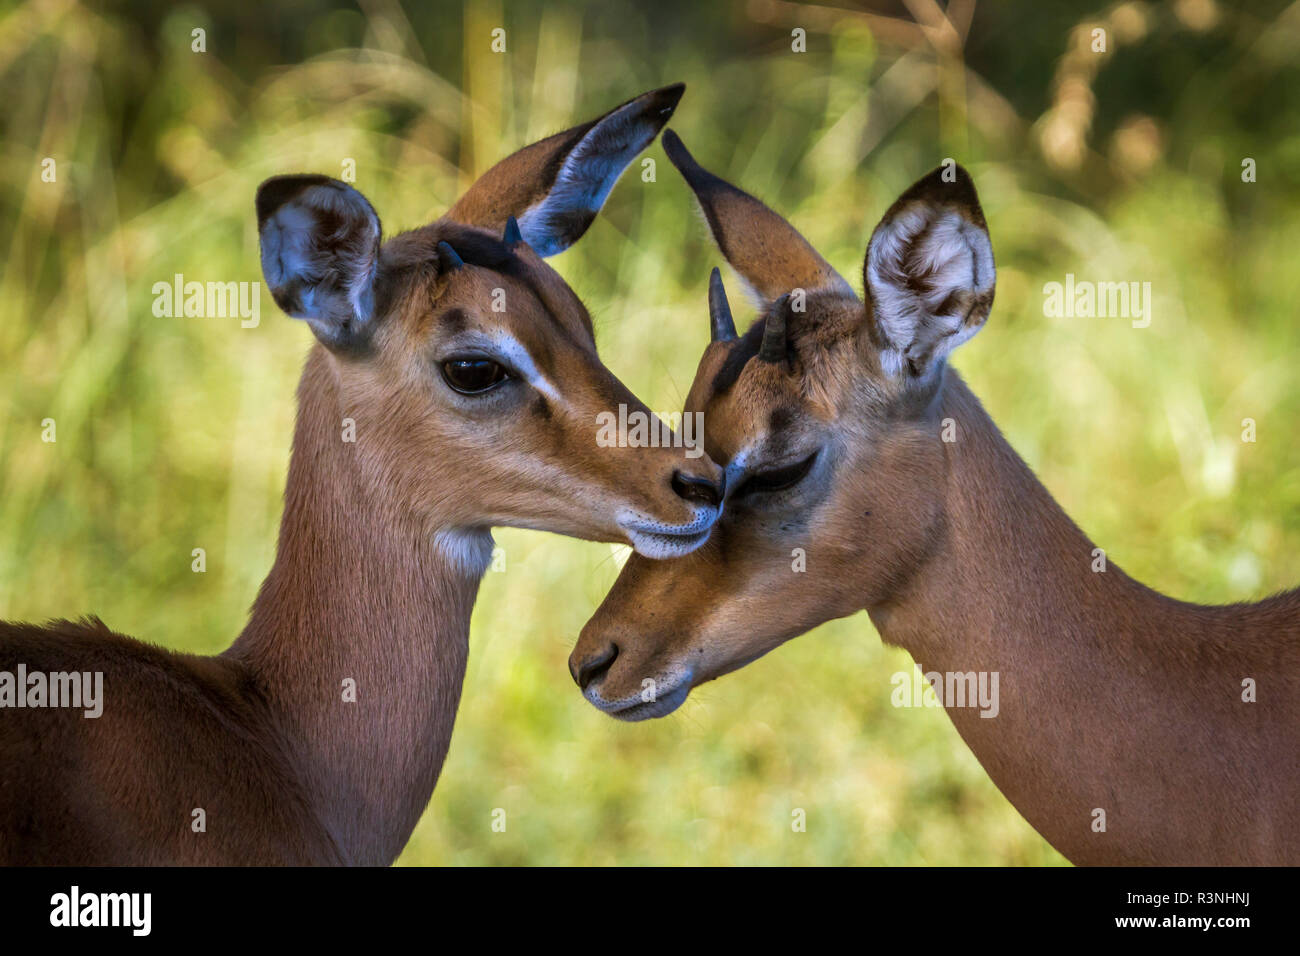 Gemeinsame Impala im Krüger Nationalpark, Südafrika. Specie Aepyceros melampus Familie der Hornträger Stockfoto